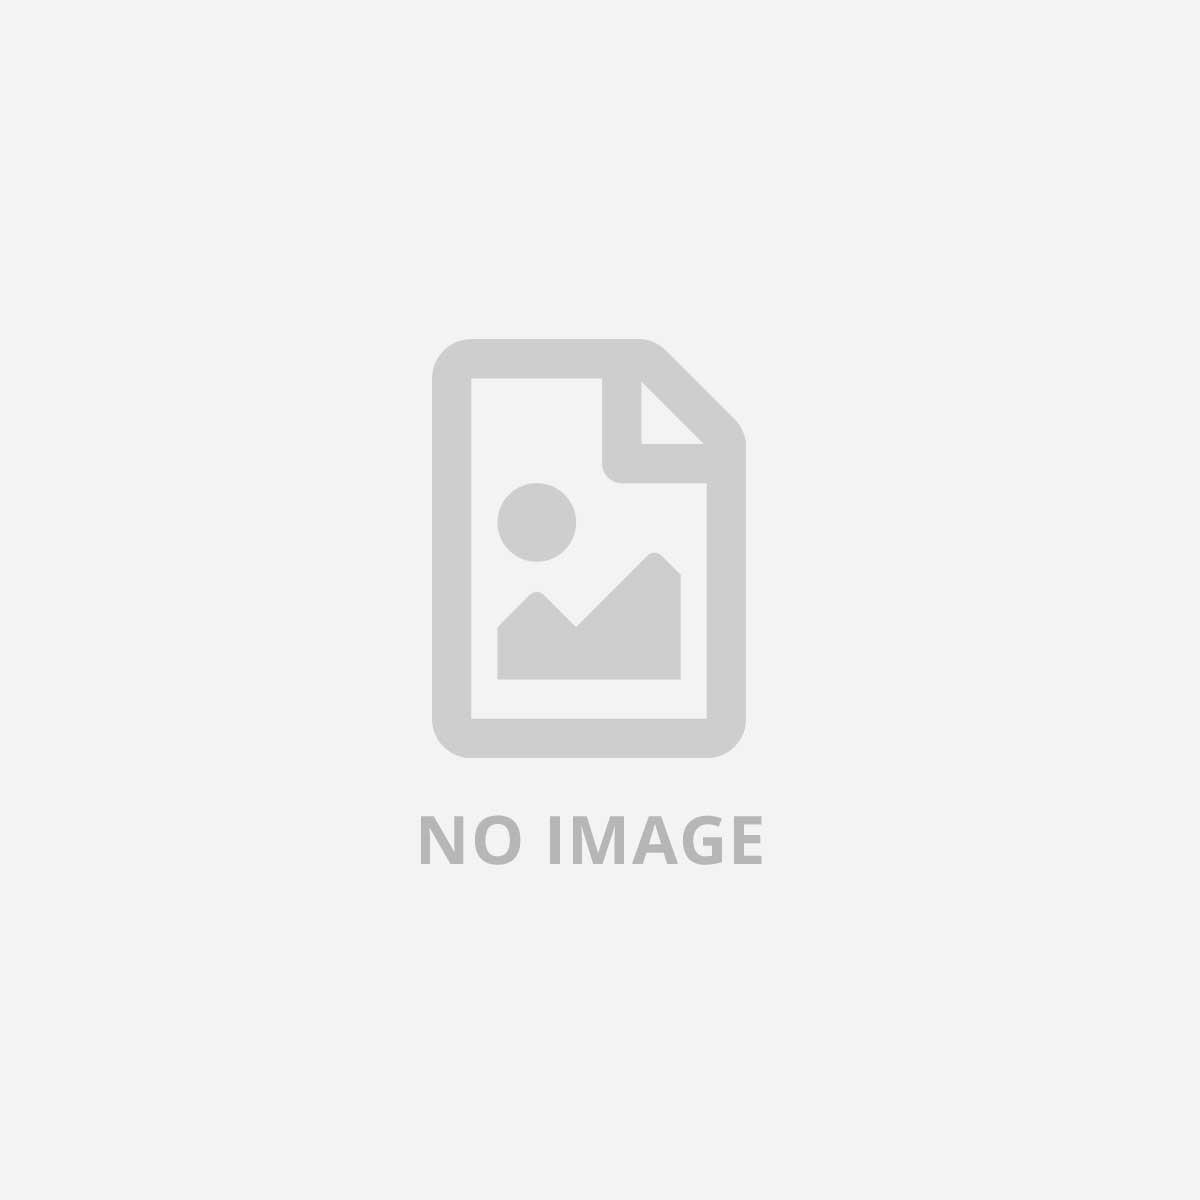 SCOTCH NASTRO TRASP  508 19MMX33M